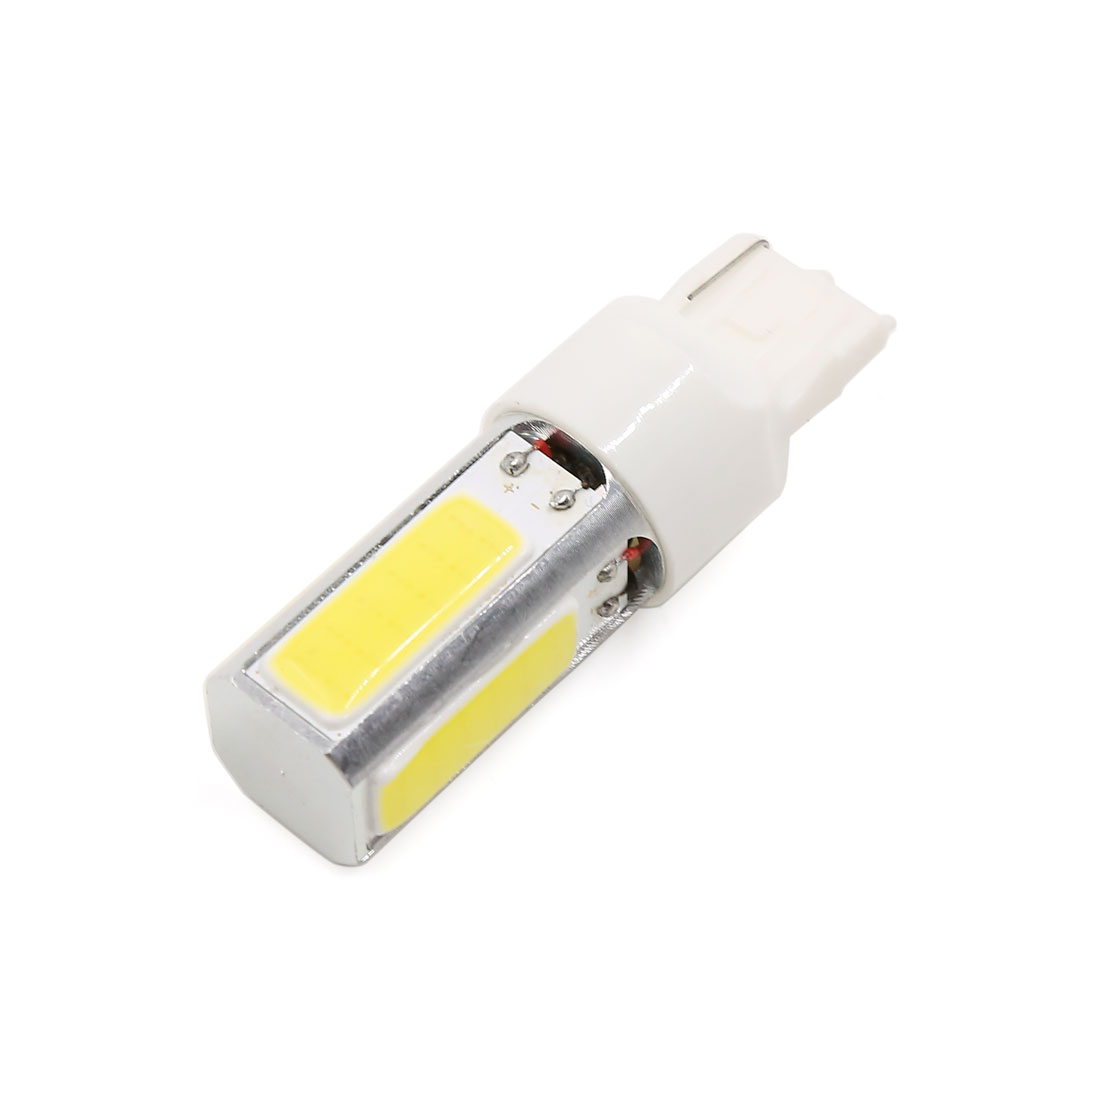 7440 W21W T20 White 4 COB LED Reverse Backup Turn Signal Lamp Light Bulbs